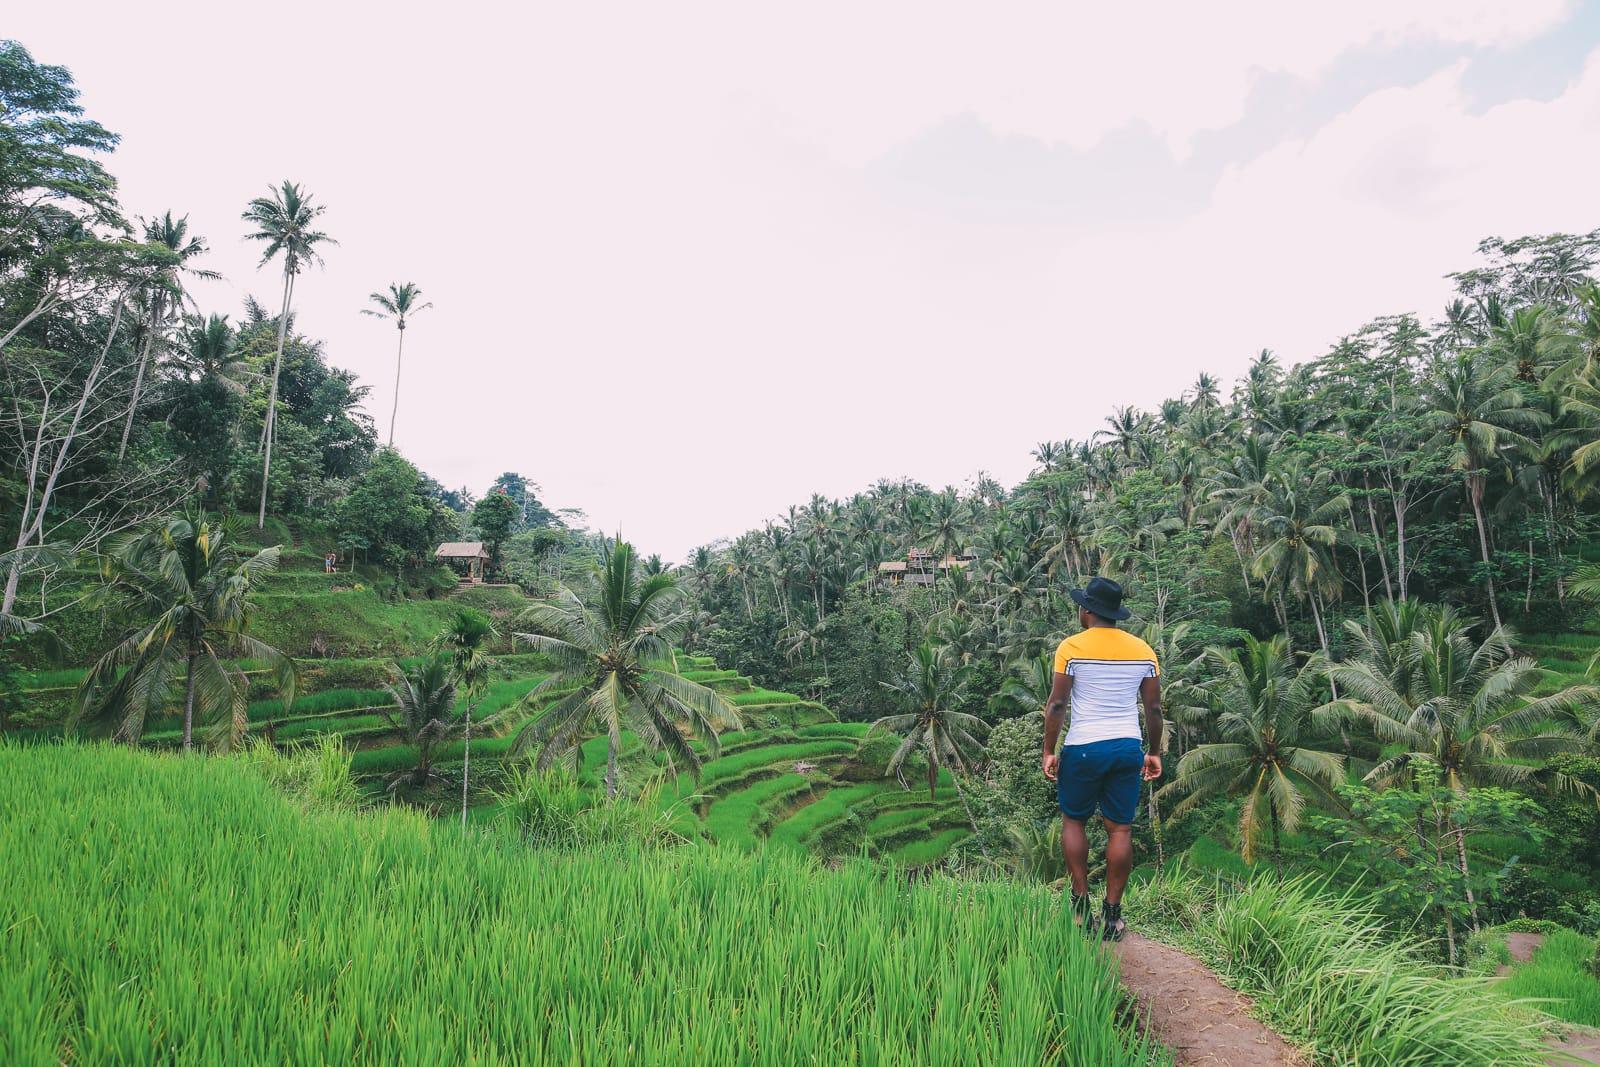 Bali Travel - Tegalalang Rice Terrace In Ubud And Gunung Kawi Temple (10)